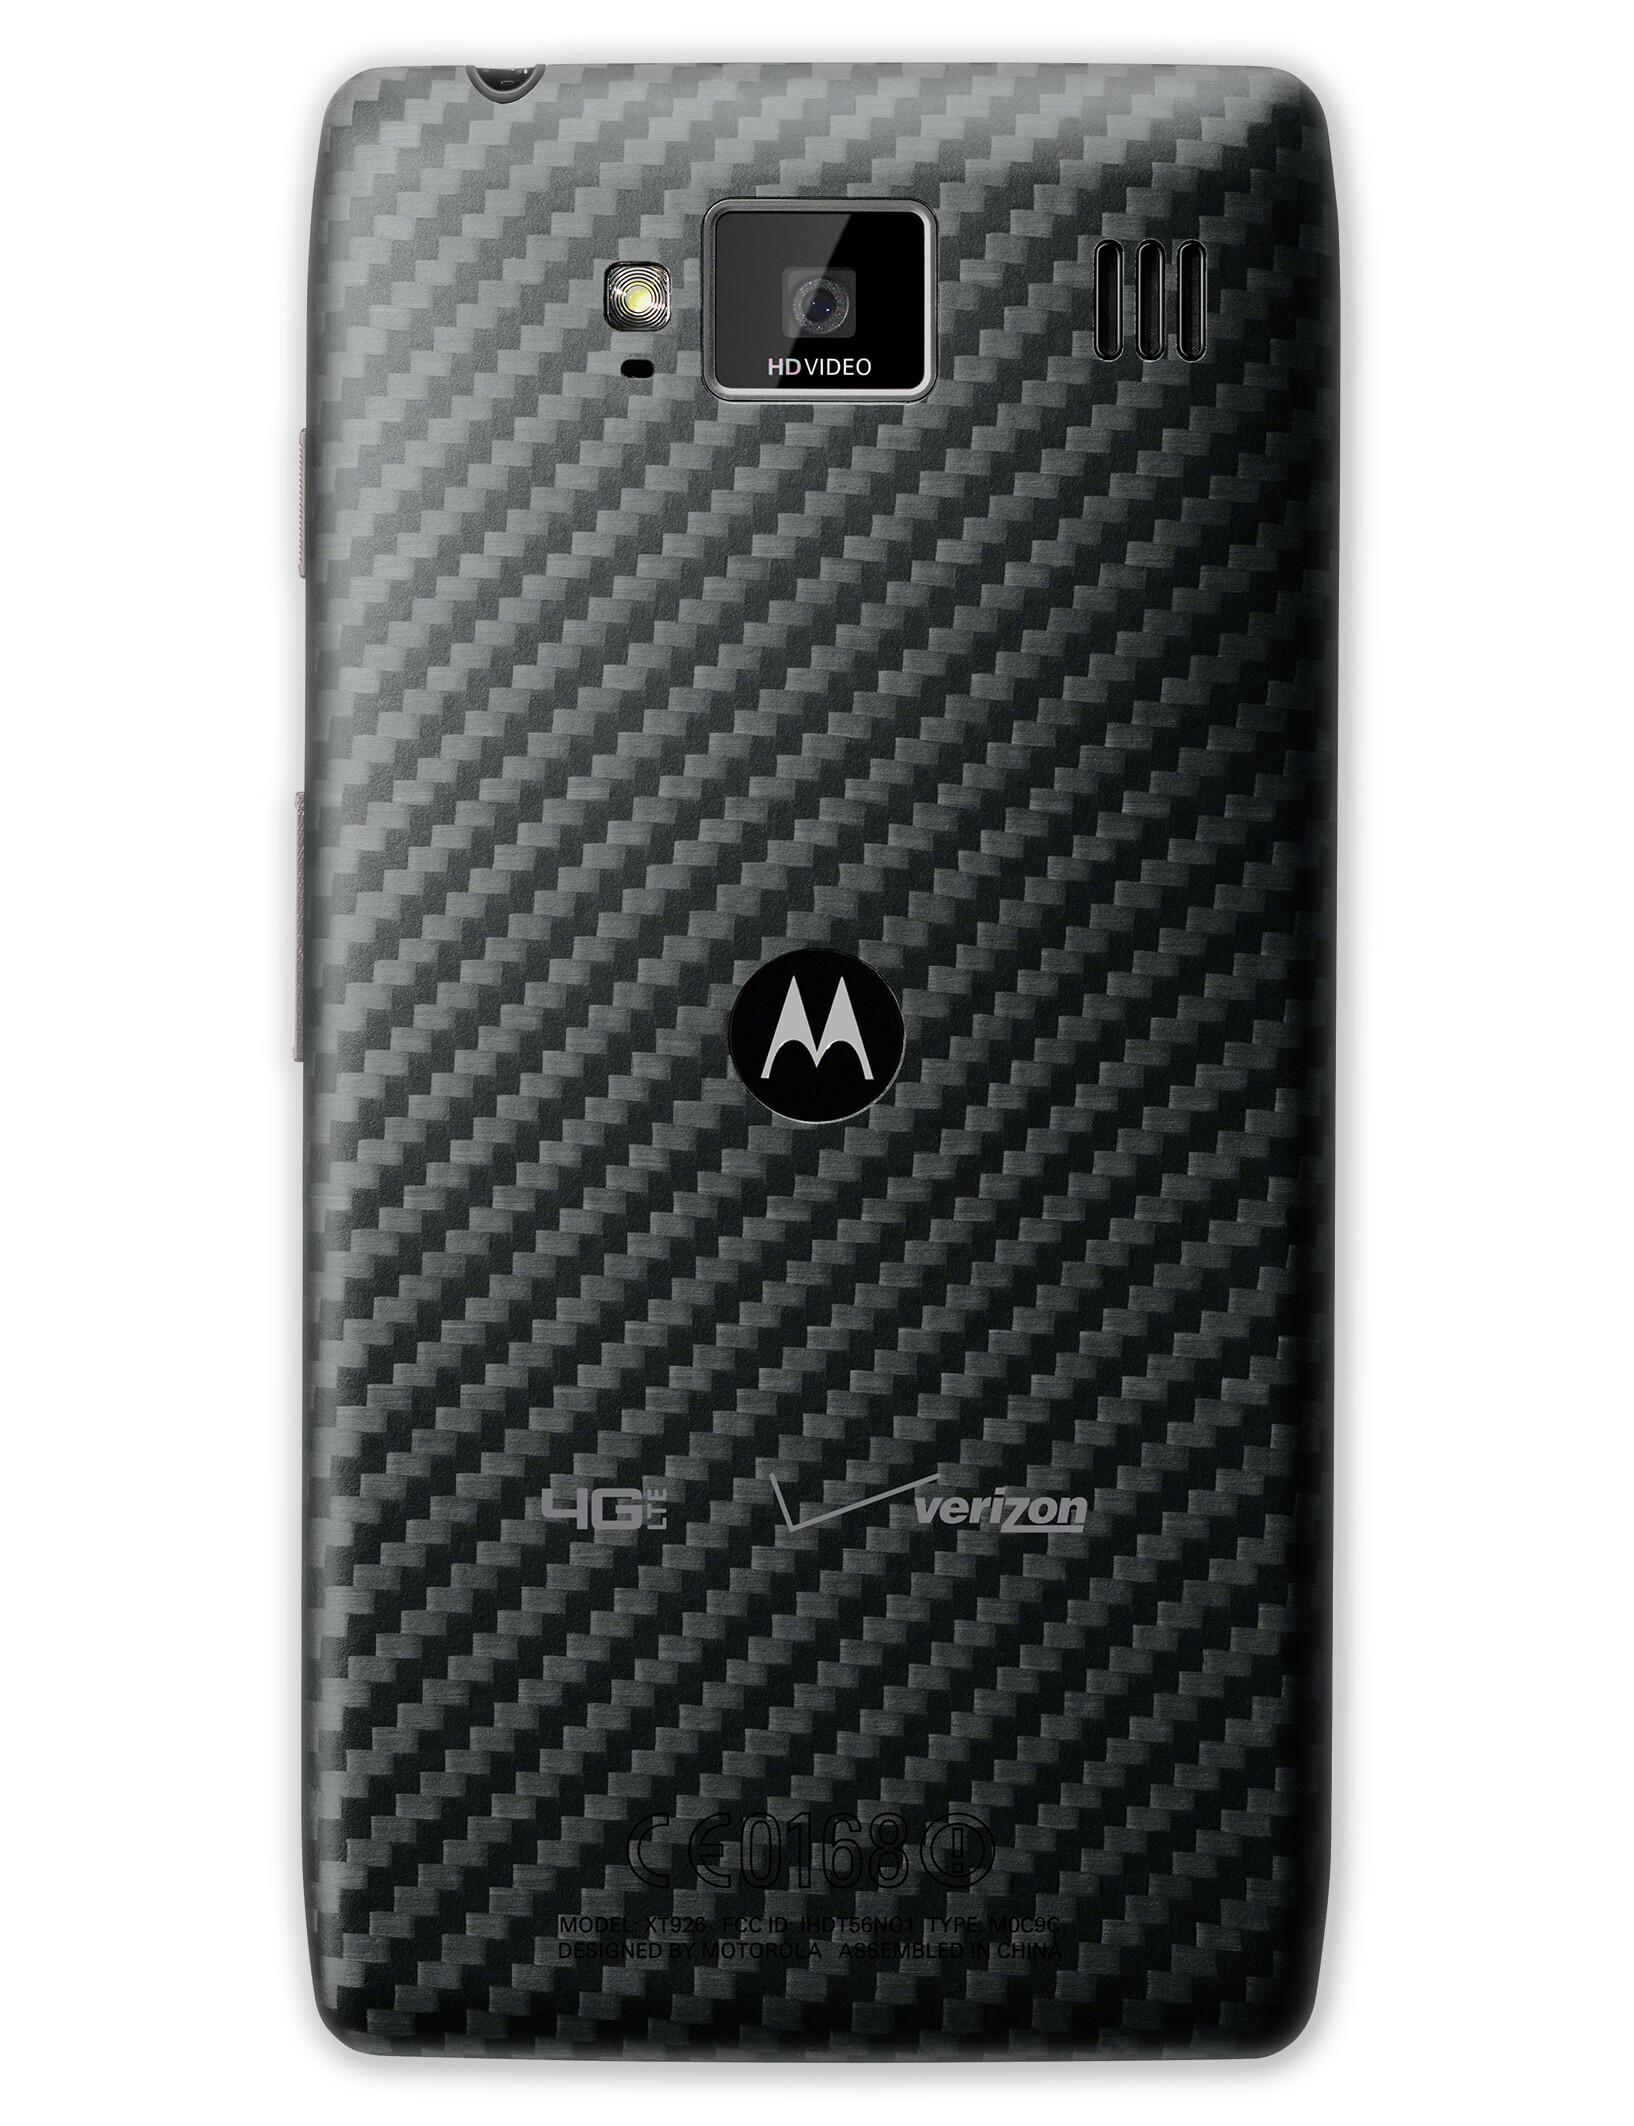 motorola droid razr hd photos rh phonearena com Motorola RAZR M Cell Phone Droid RAZR Maxx 4G